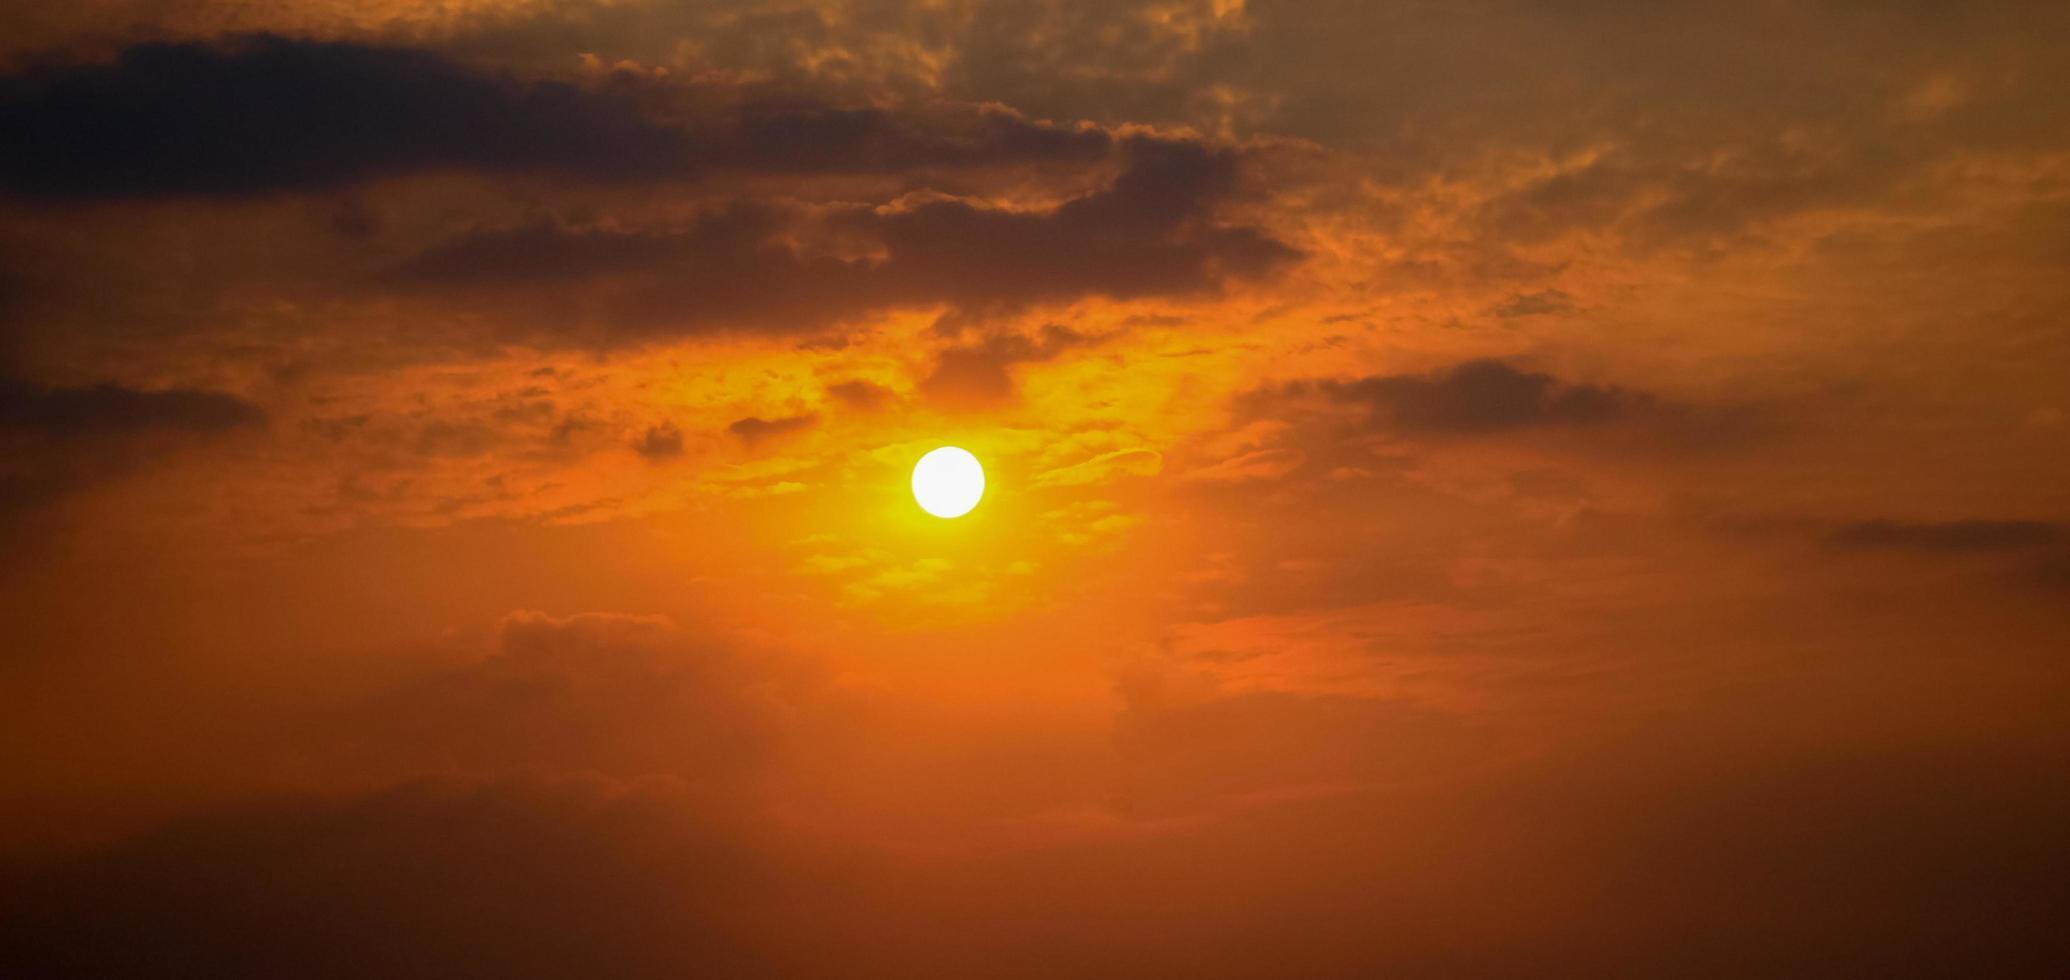 Blurred sun and beautiful orange sky photo